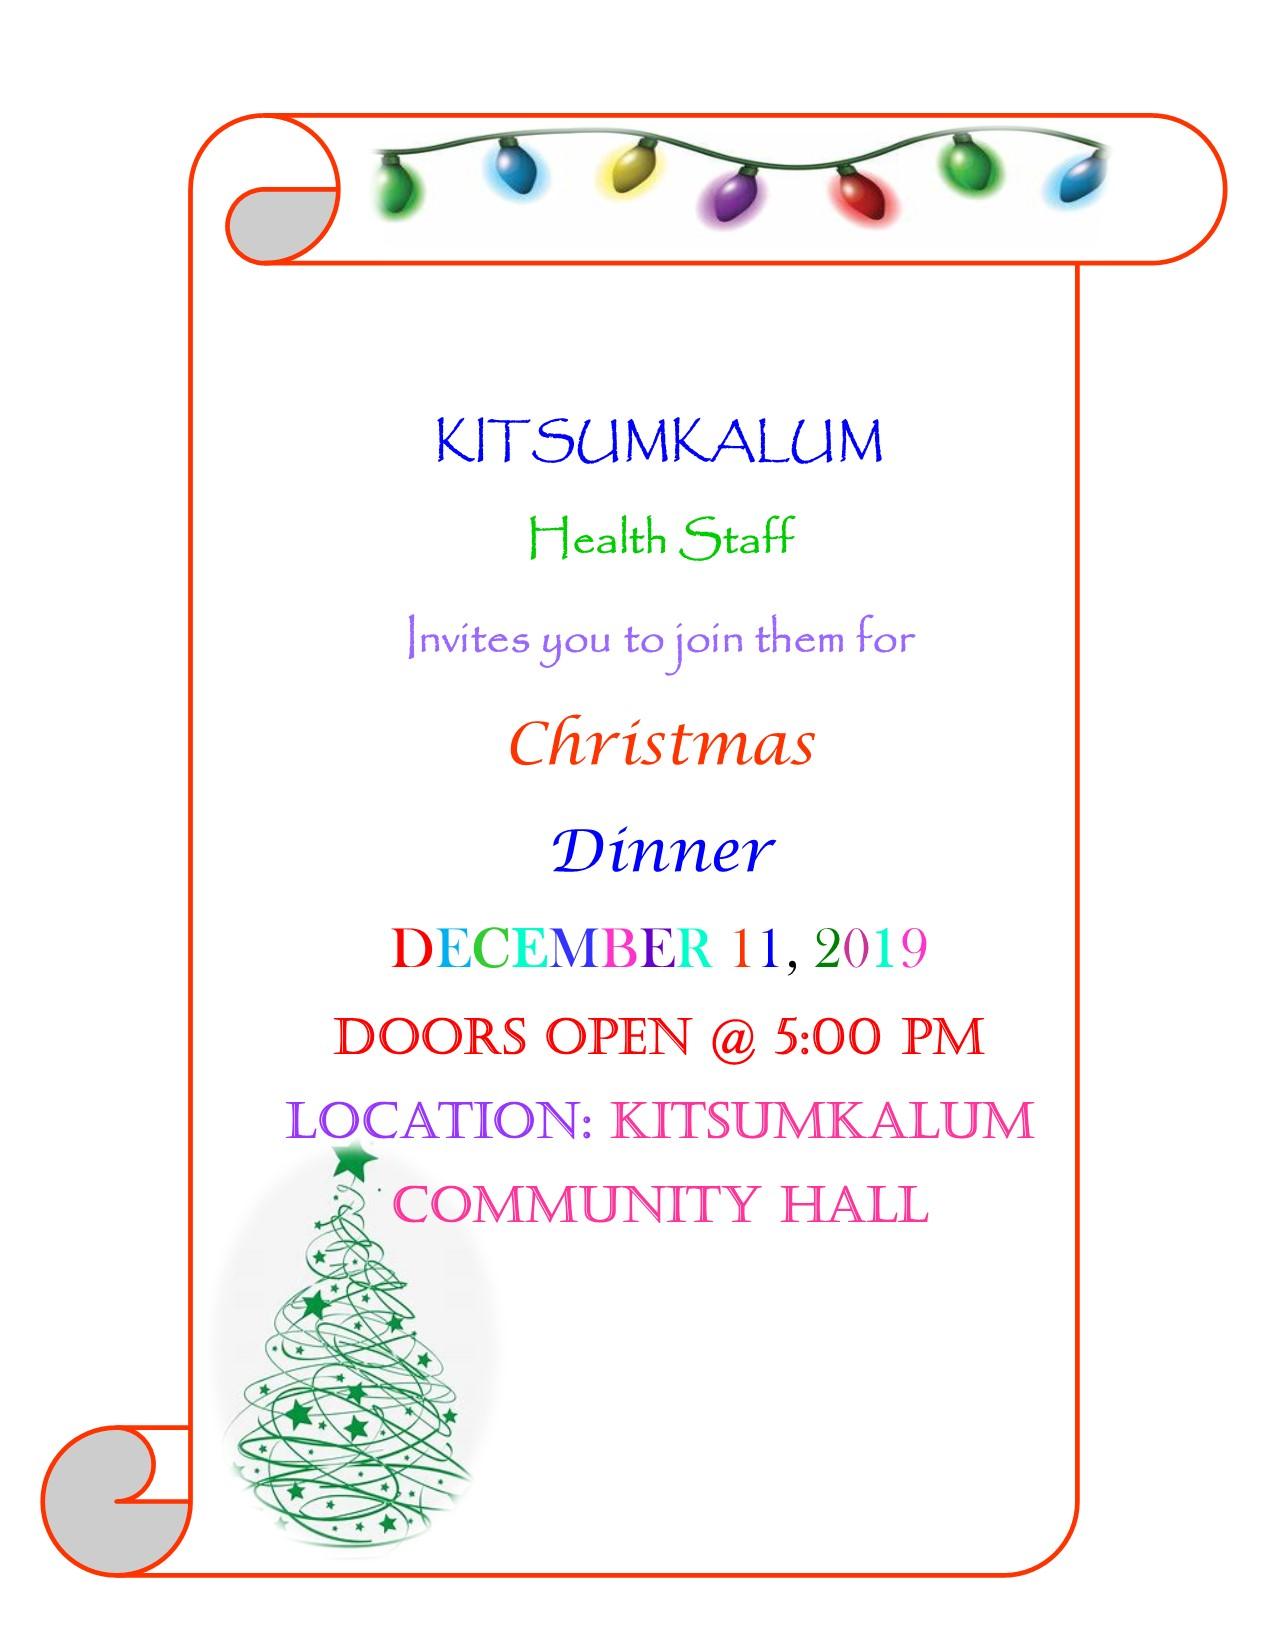 Kitsumkalum Health – Community Christmas Dinner DEC 11